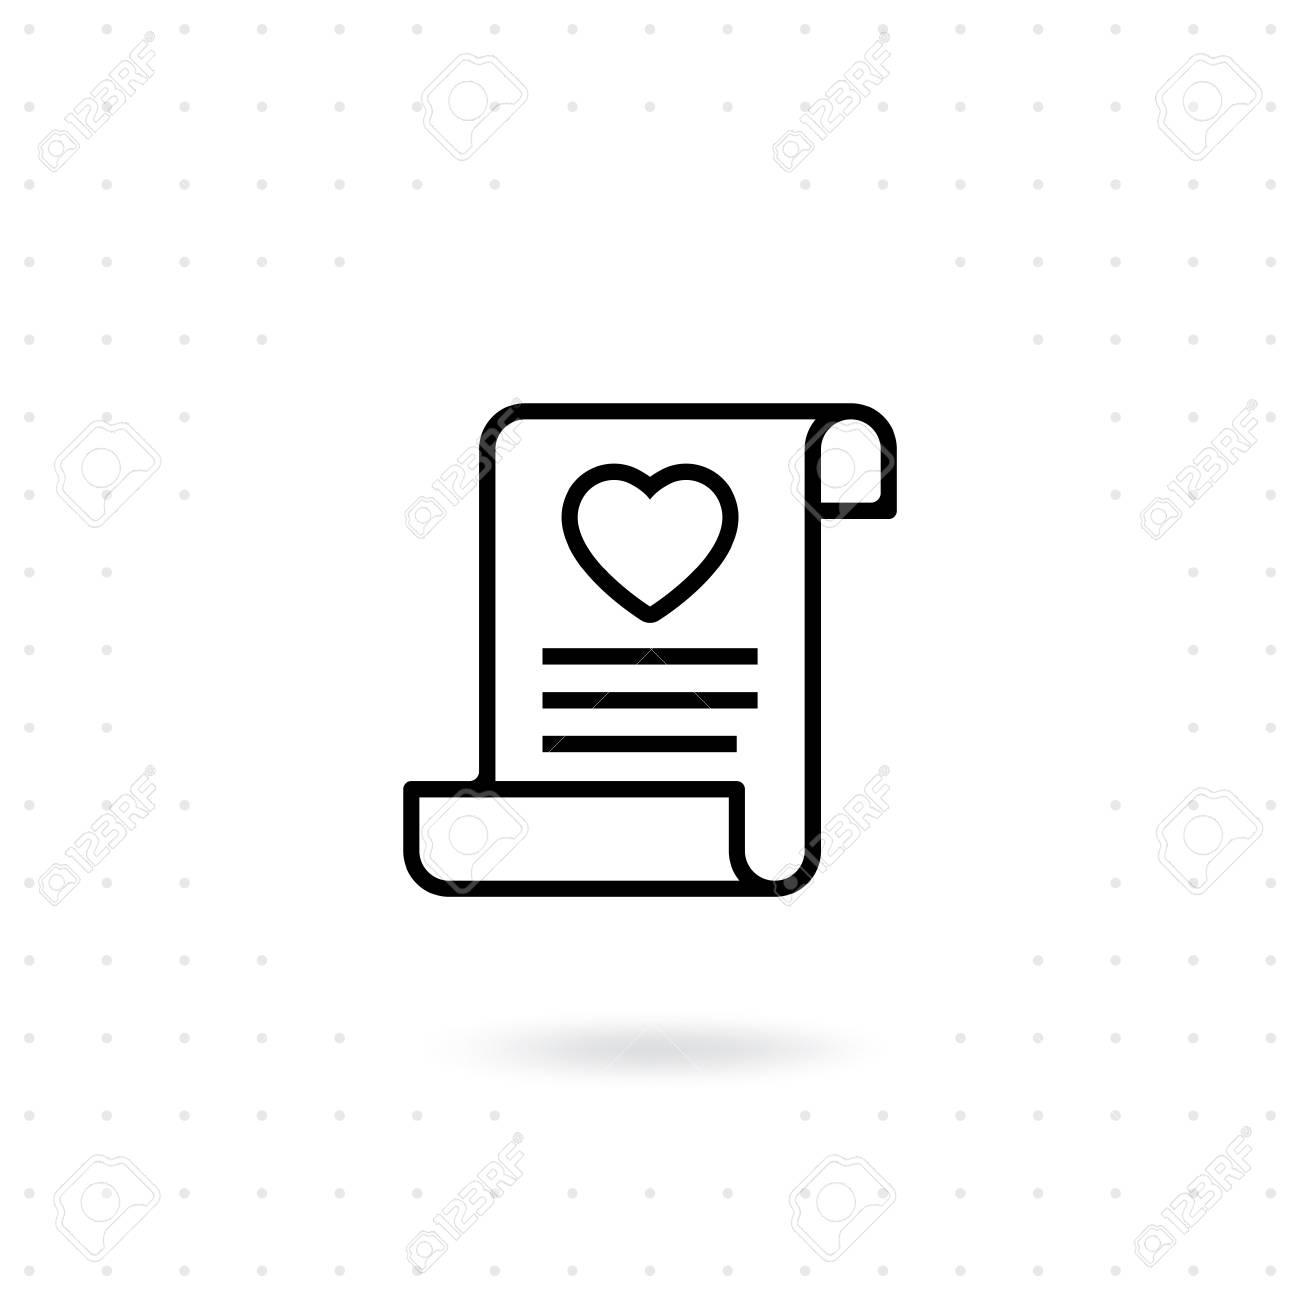 Love invitation icon love letter icon in line style vector love invitation icon love letter icon in line style vector valentines day symbol for stopboris Image collections